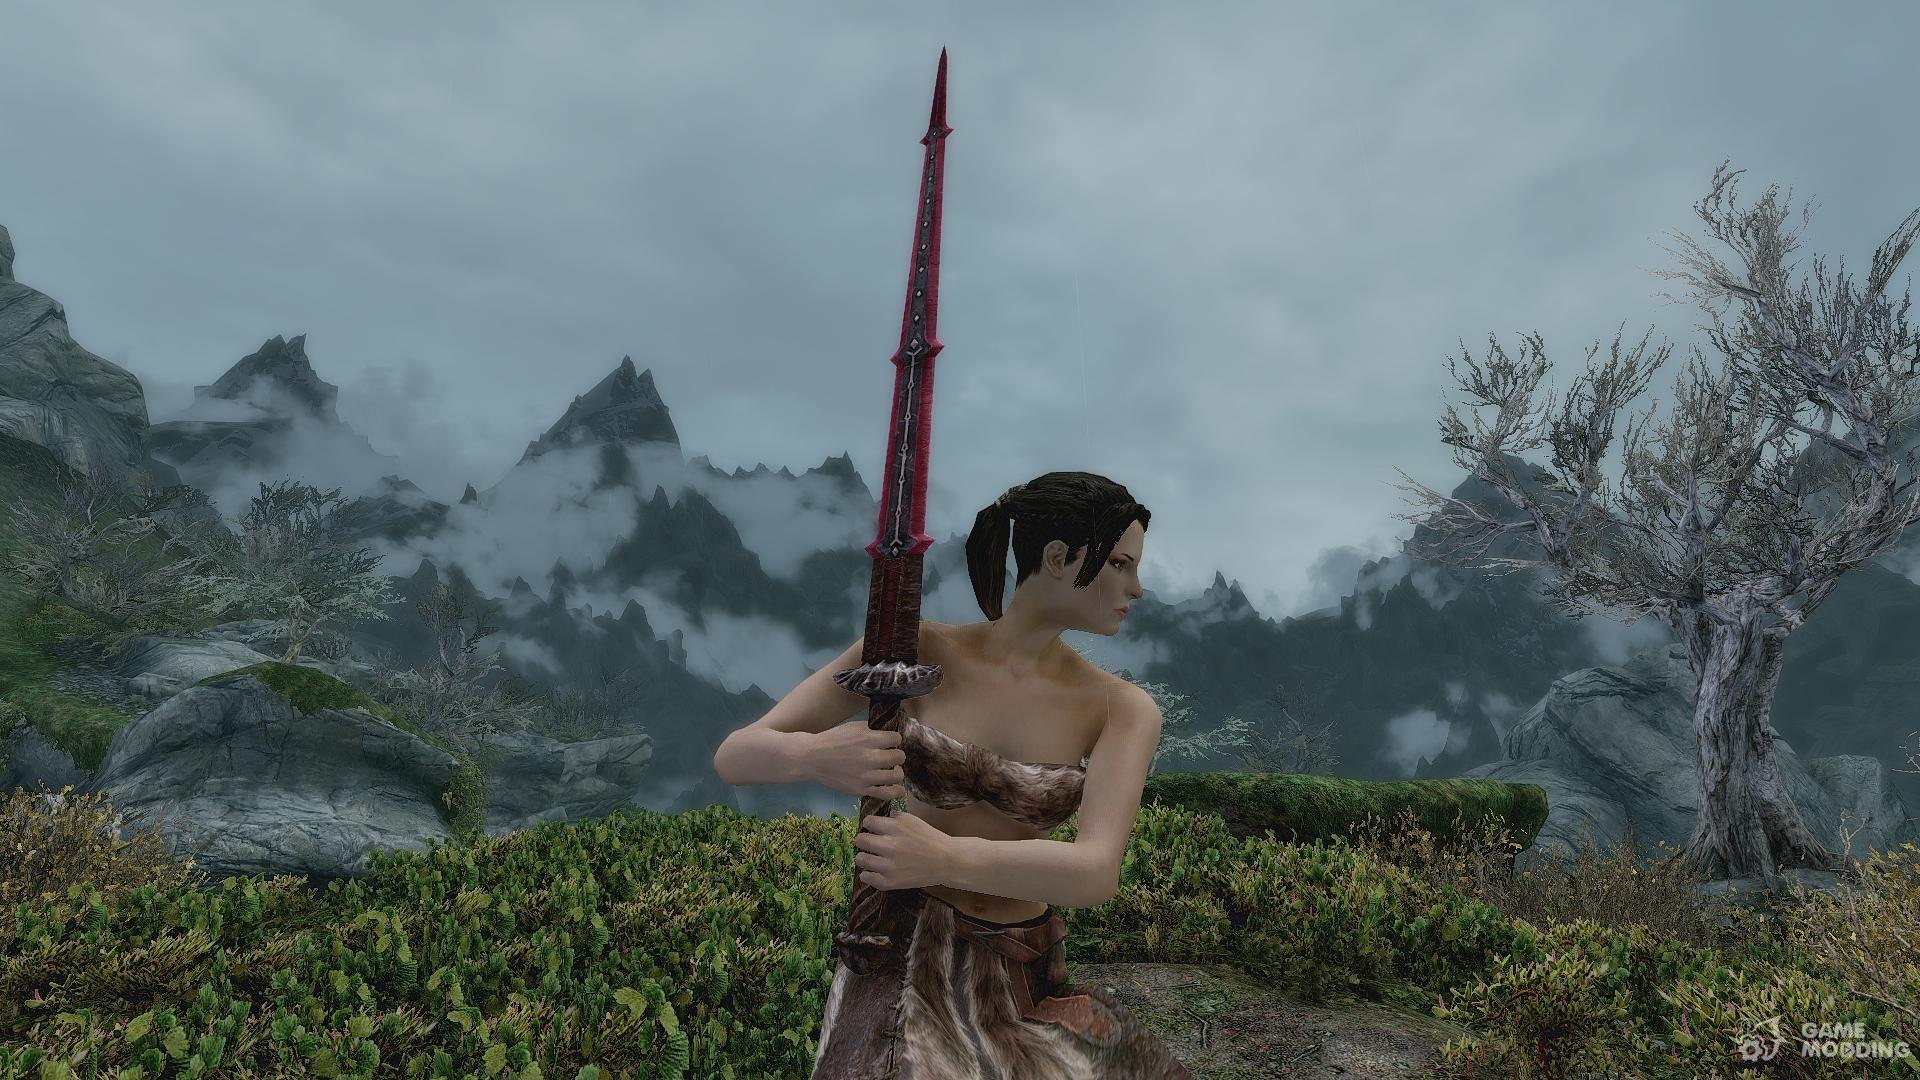 Skyrim bloodskal blade enchantment mod minecraft 1.12.2